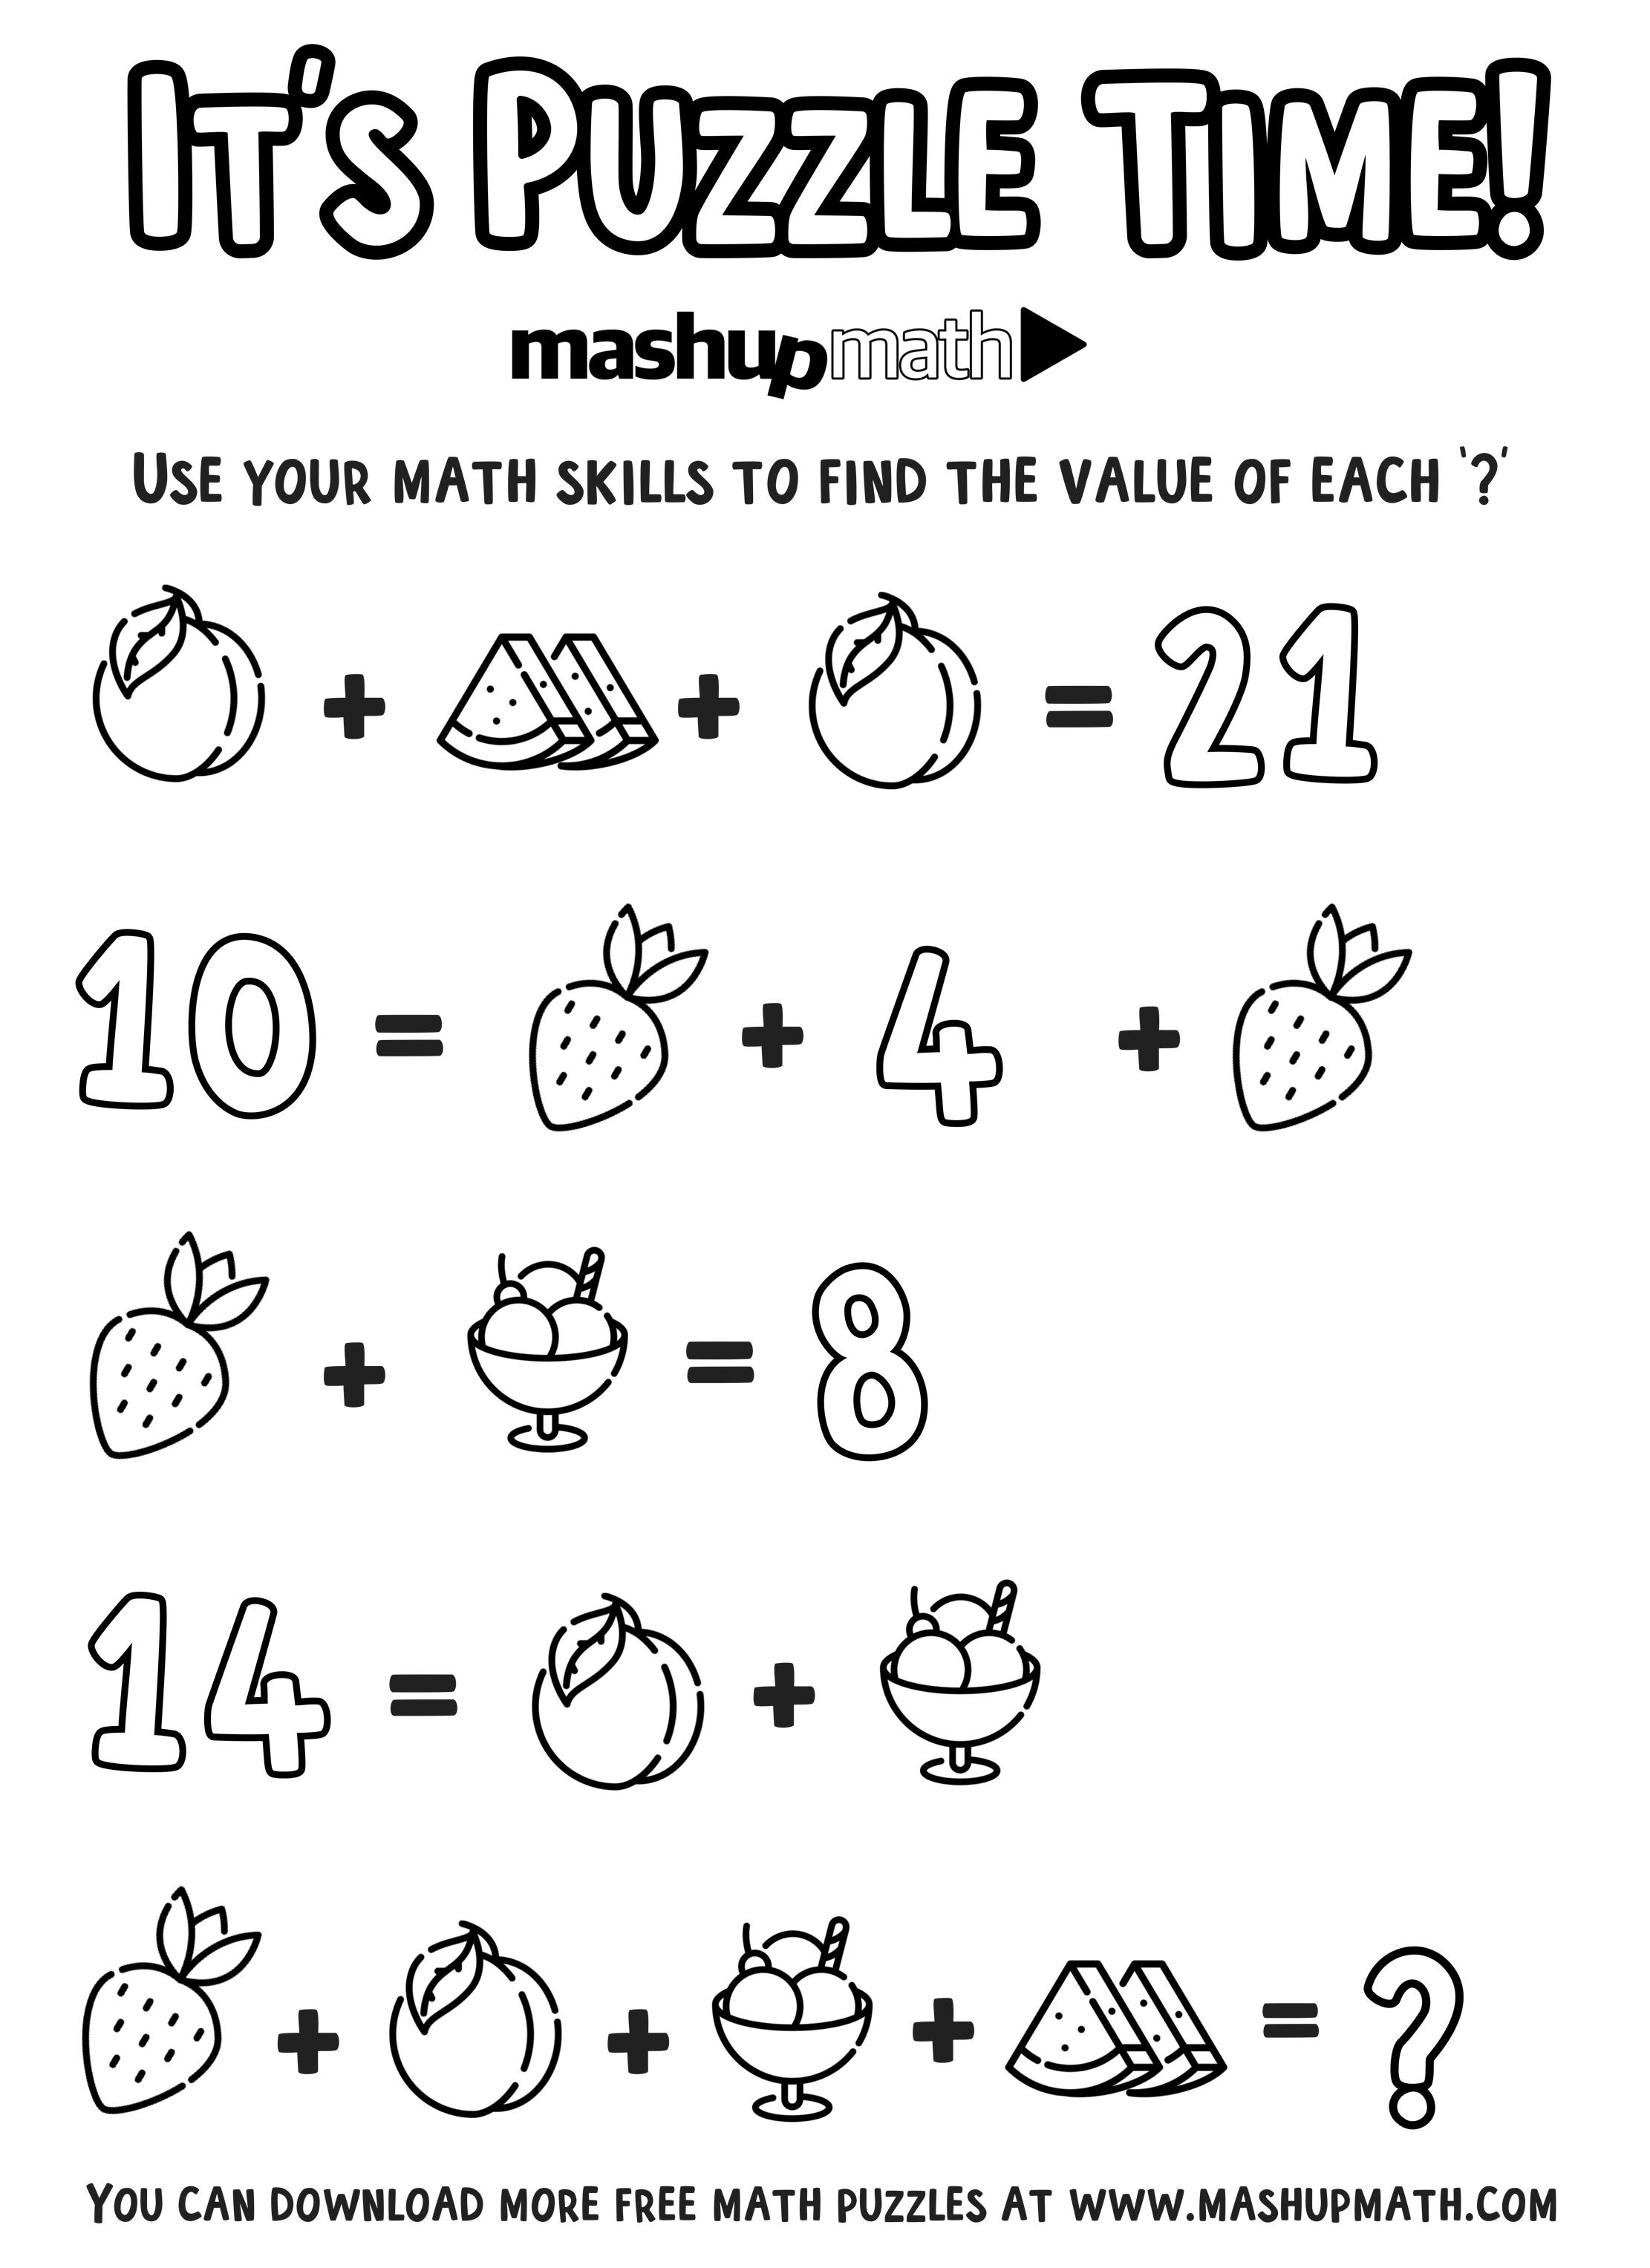 FruitPuzzle.jpg